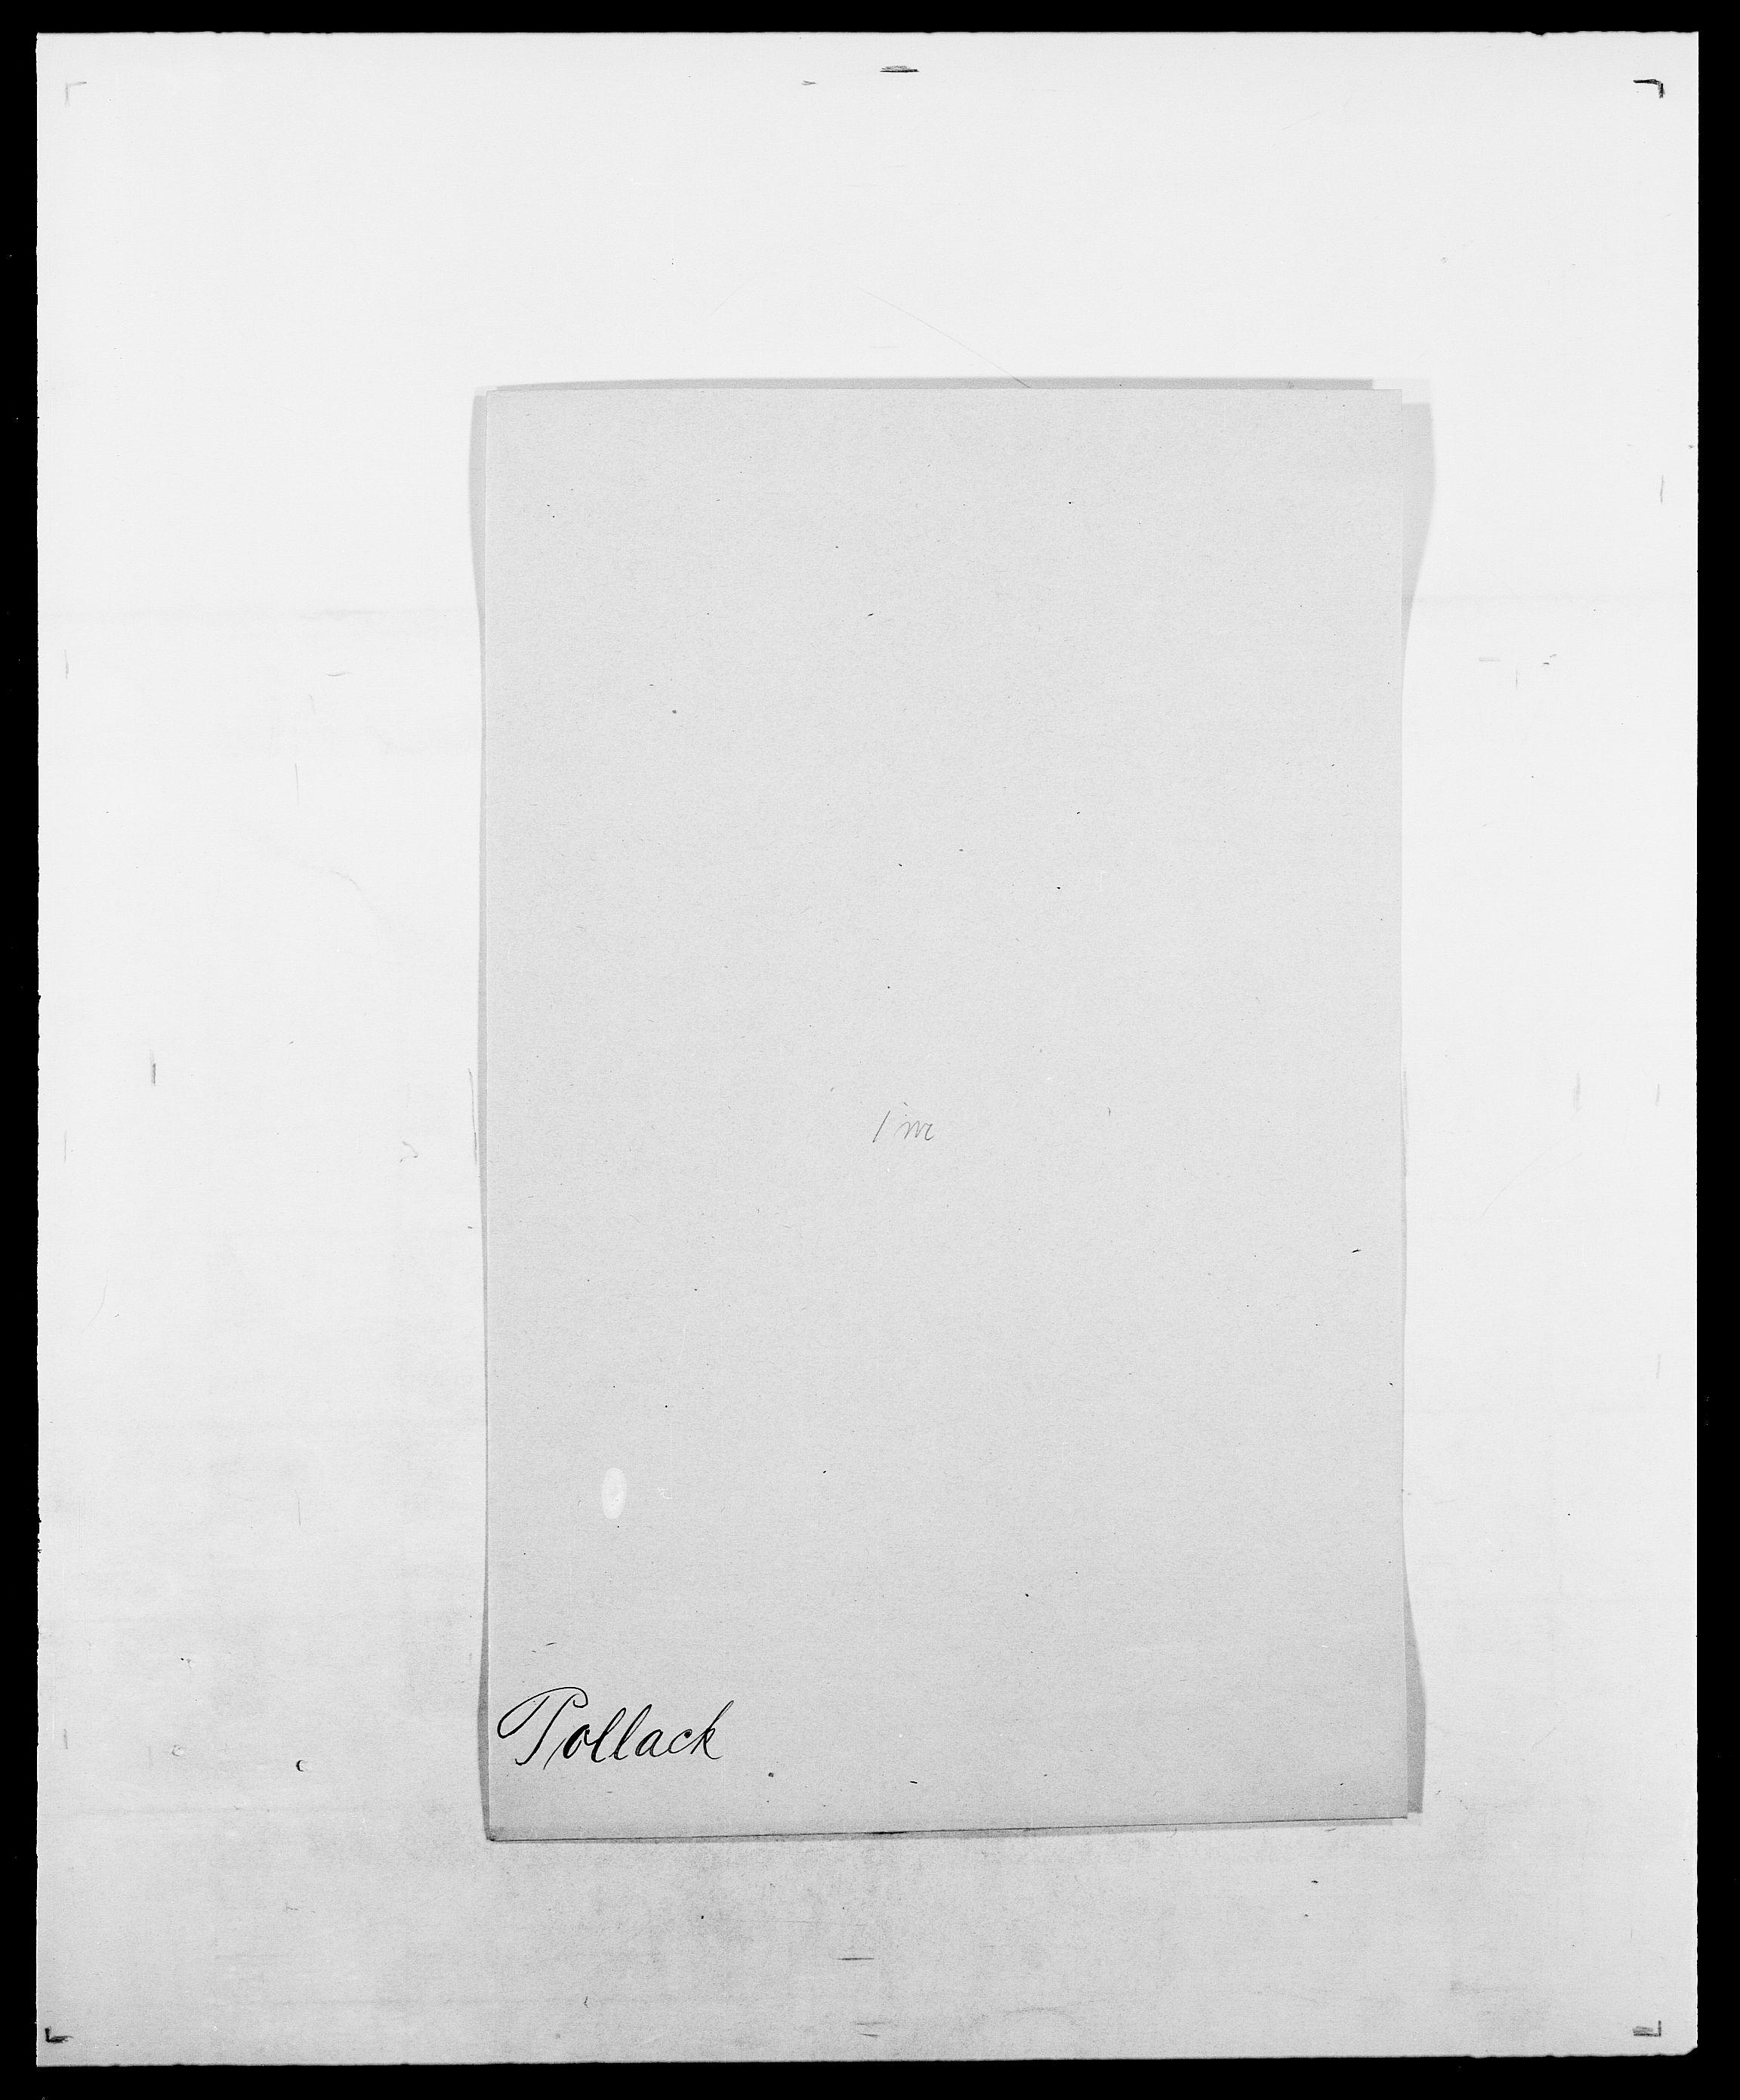 SAO, Delgobe, Charles Antoine - samling, D/Da/L0031: de Place - Raaum, s. 194